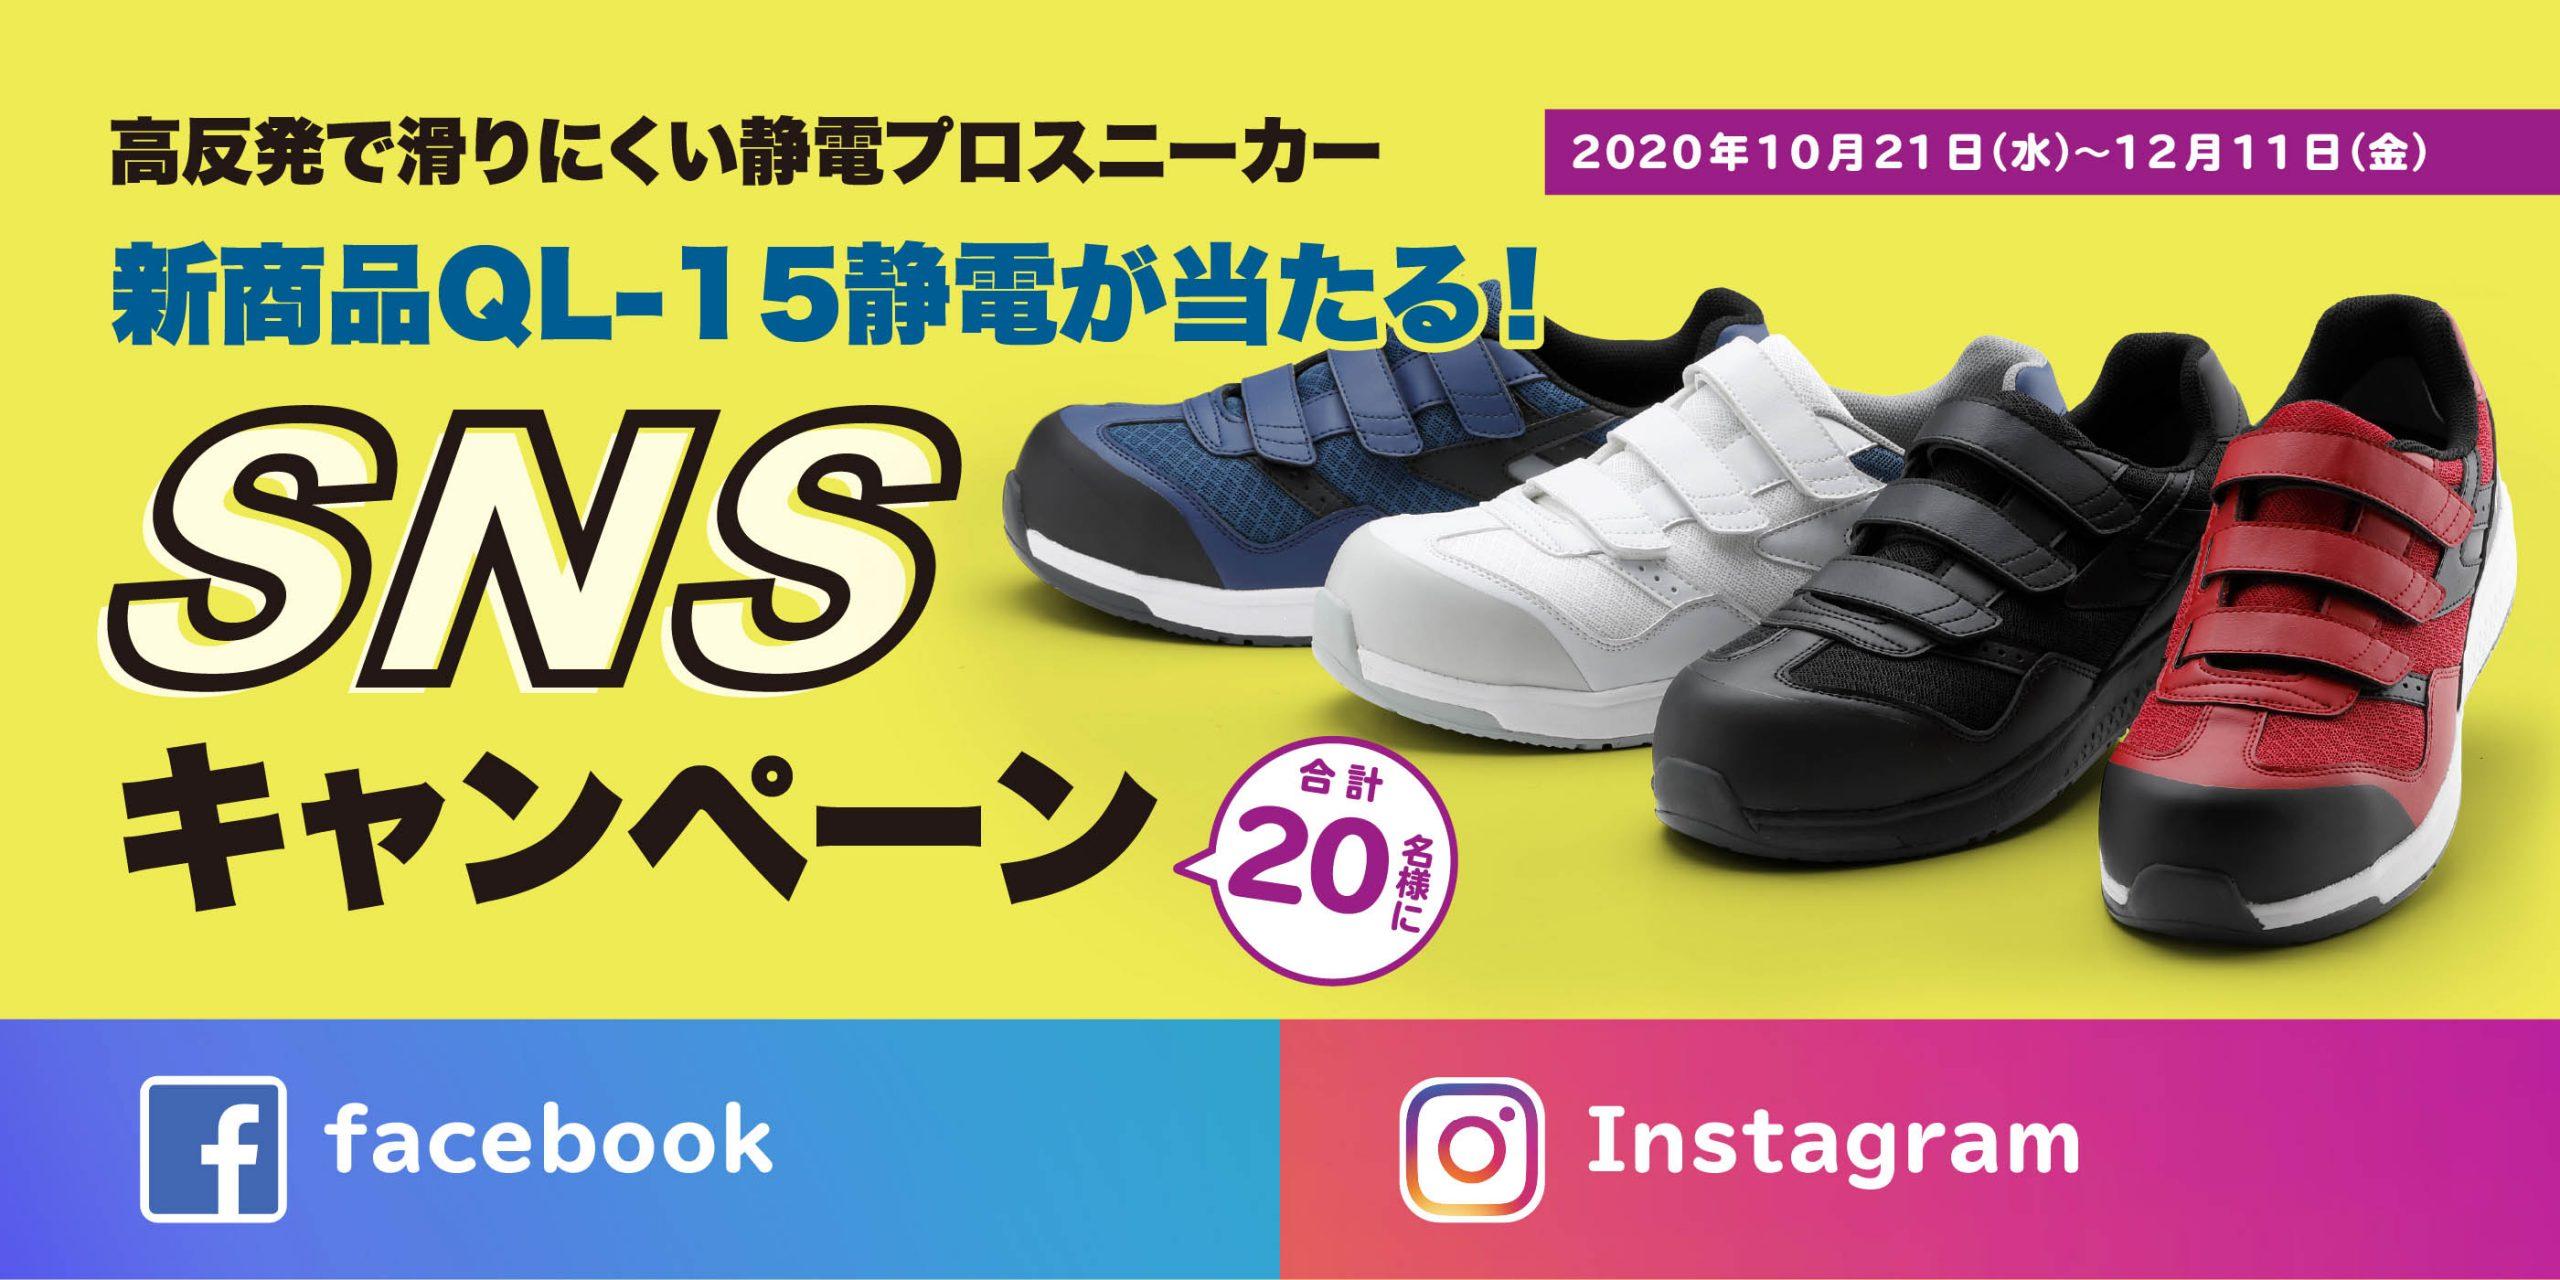 QL-15静電が当たるFacebook&Instagramキャンペーン